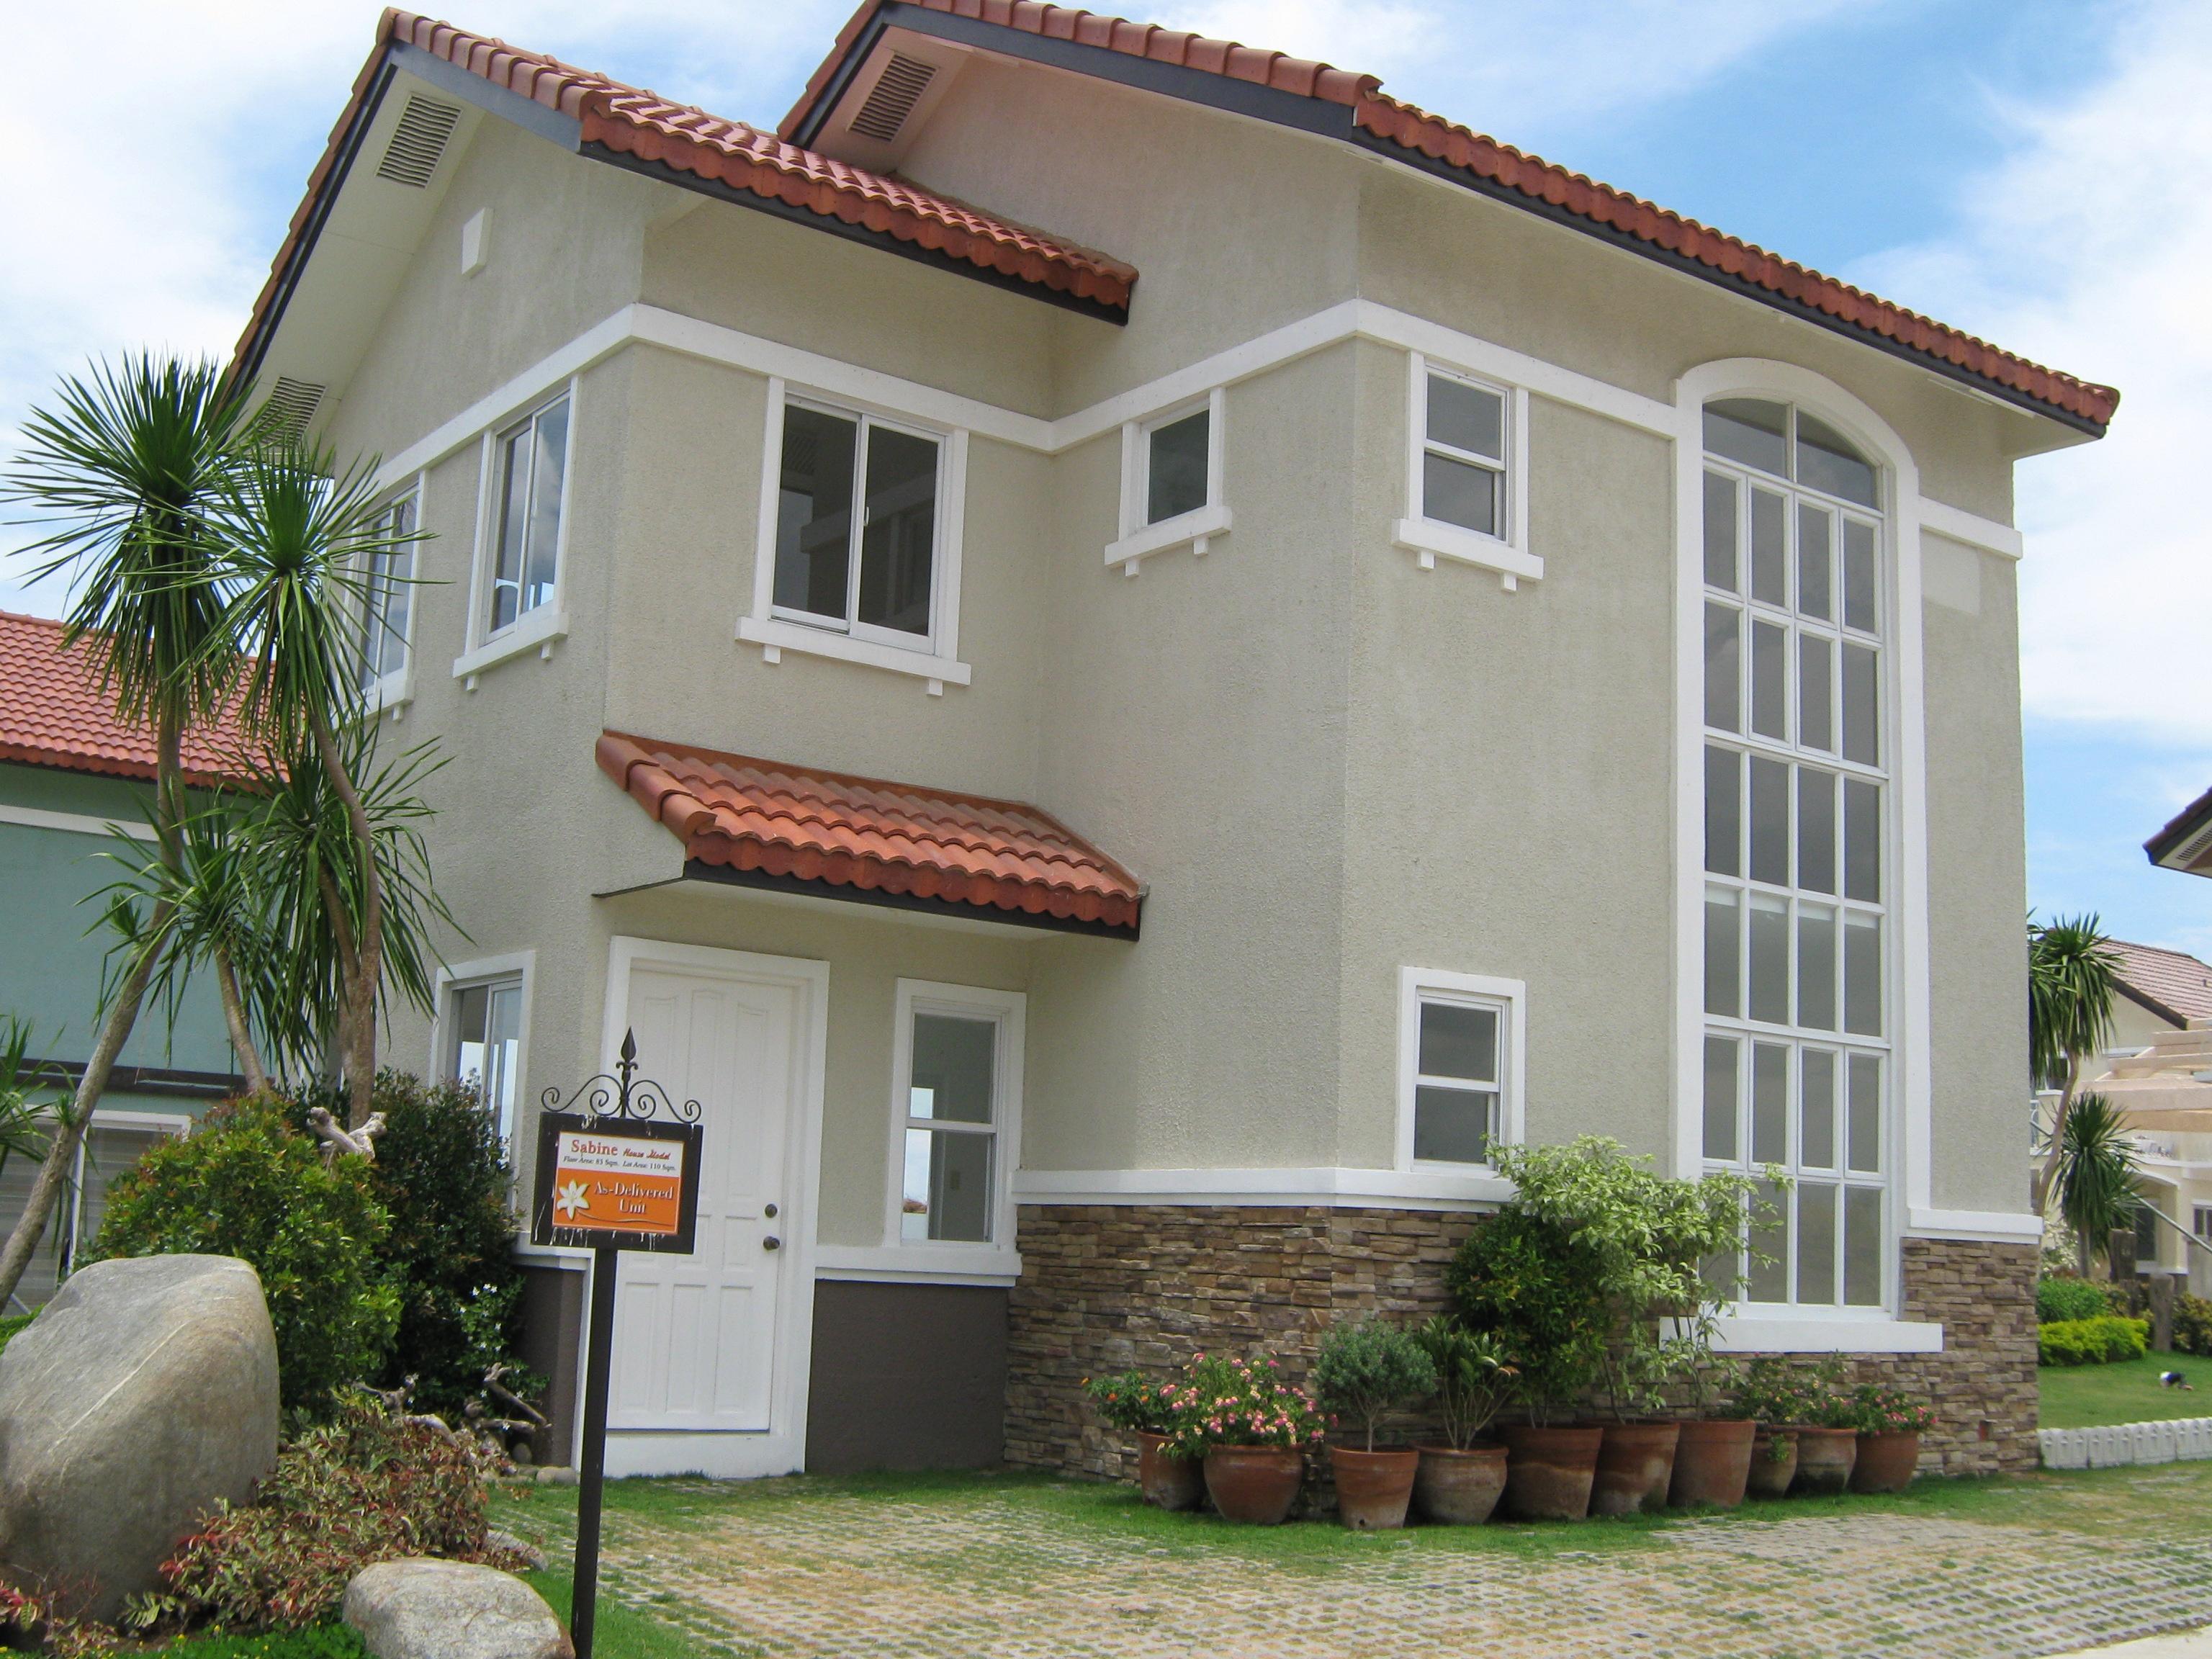 SABINE MODEL HOUSE